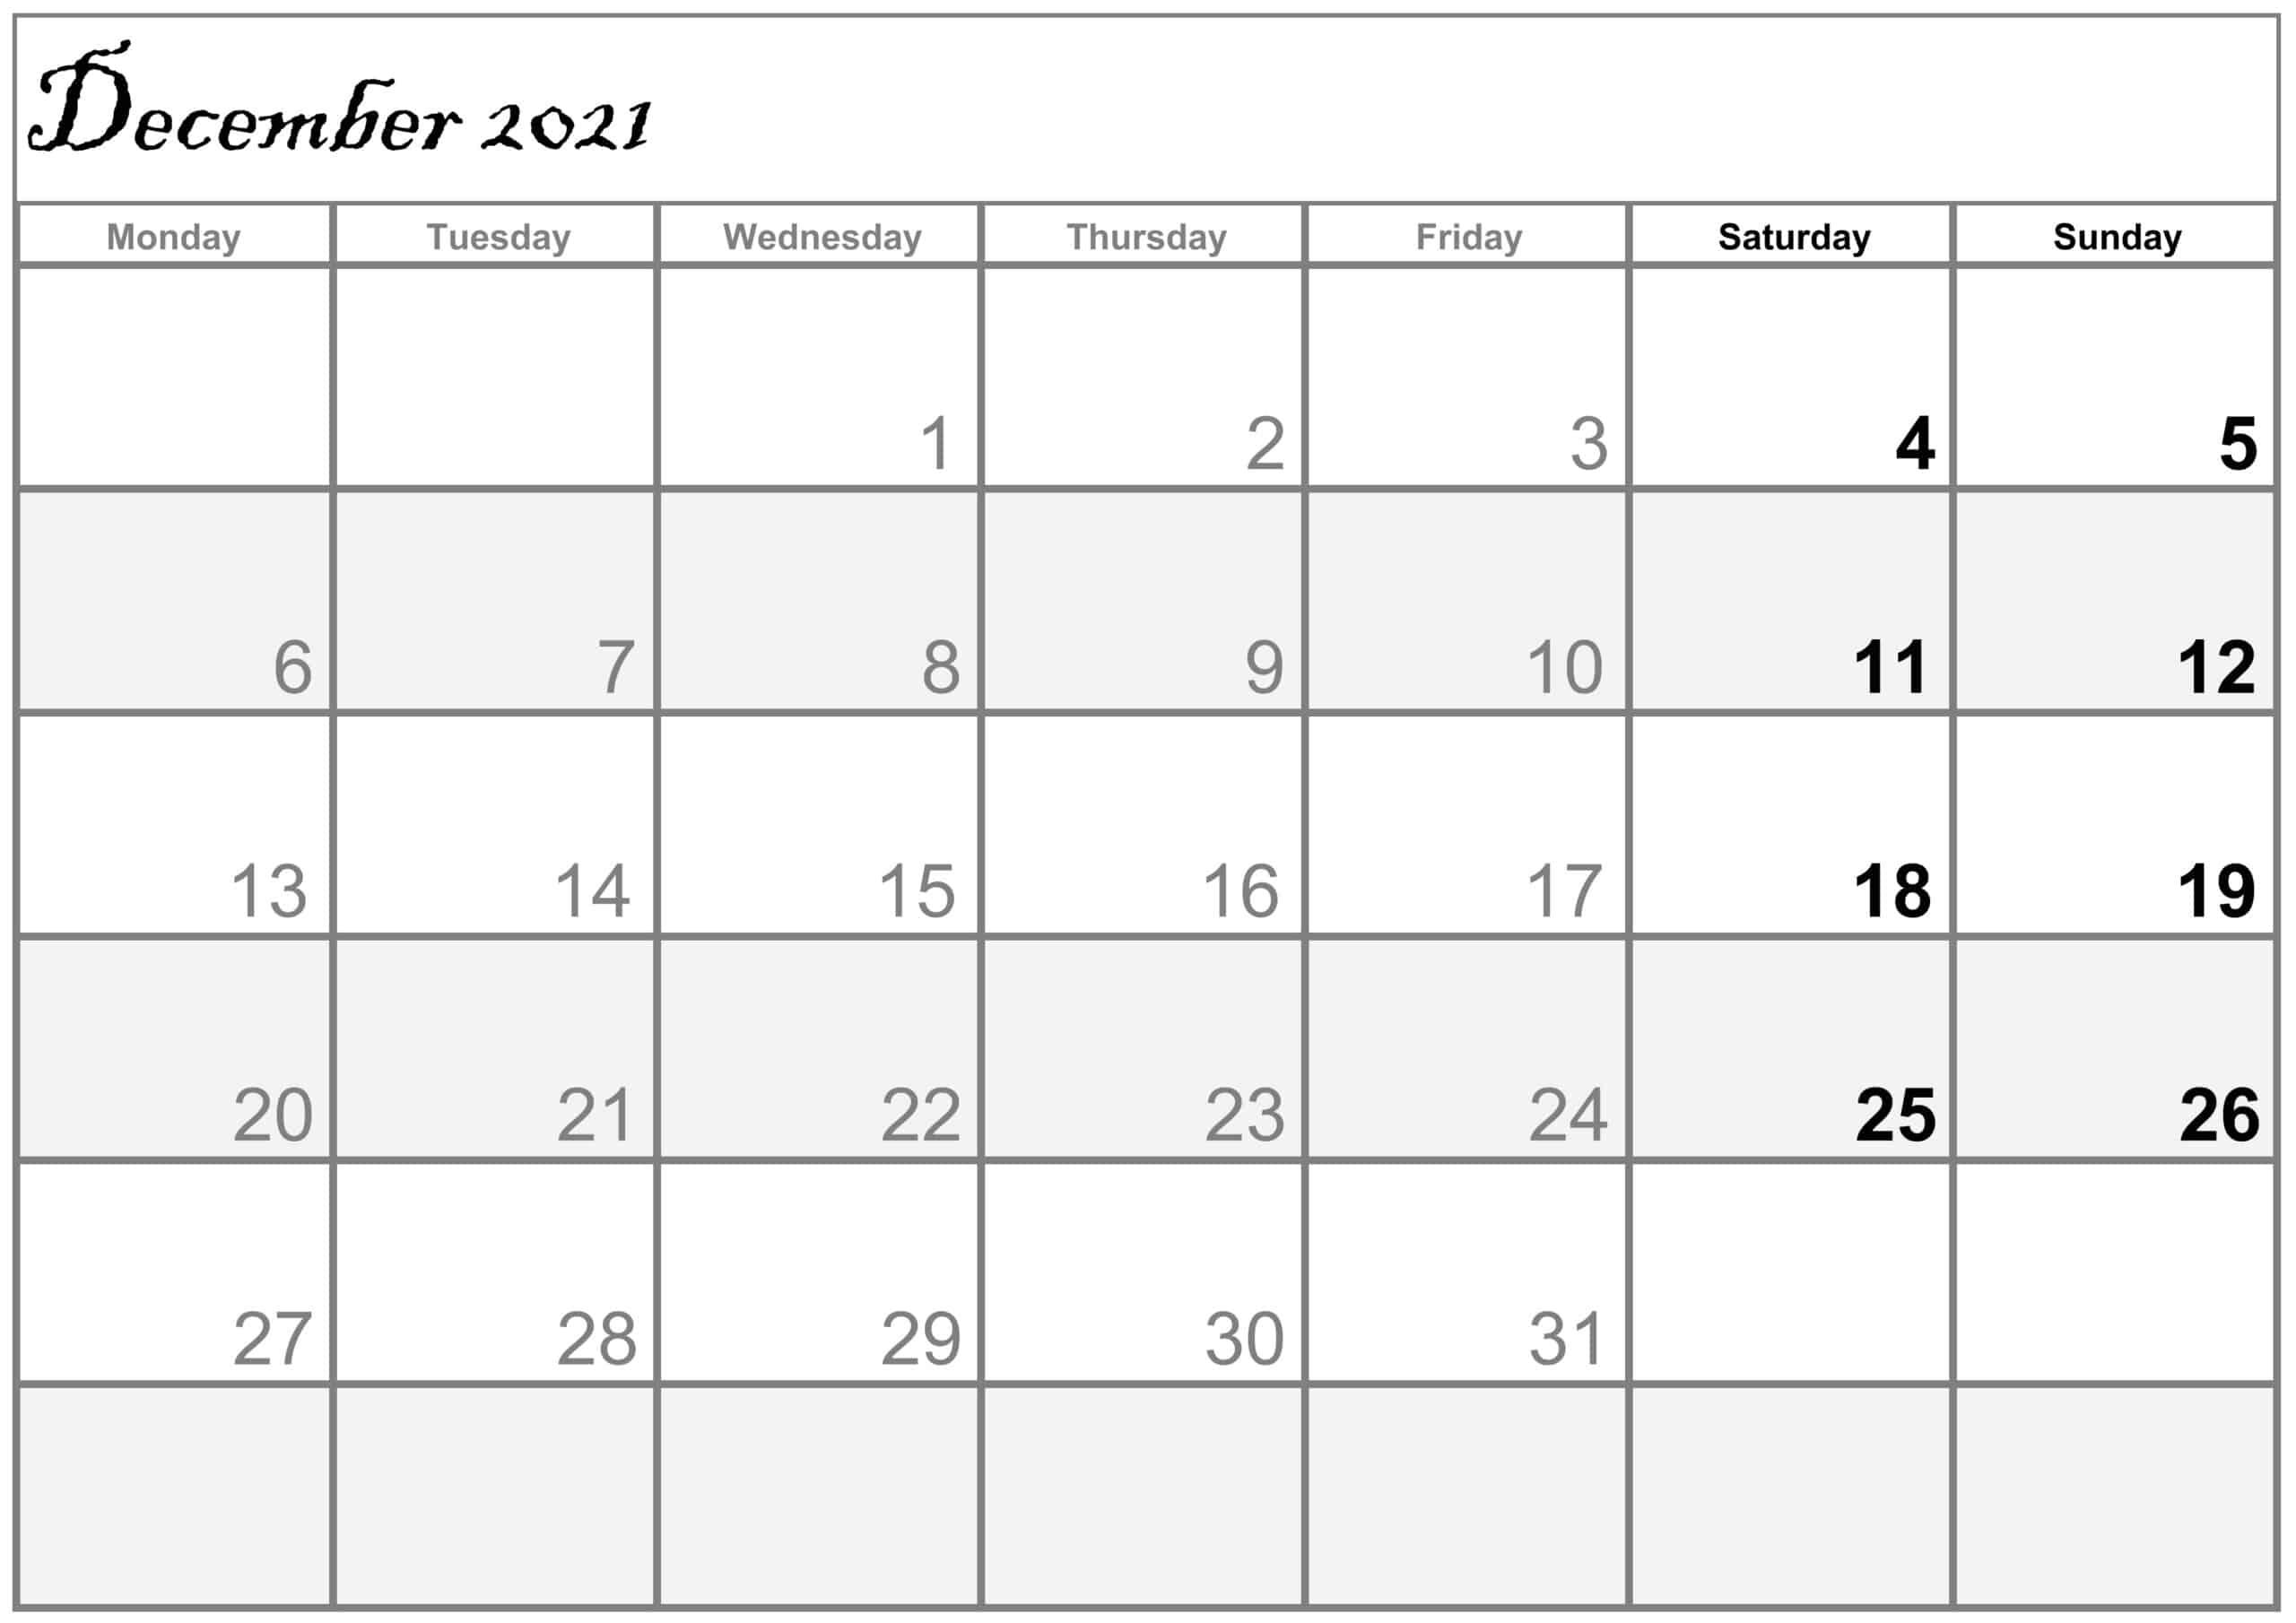 Excel December 2021 Calendar free